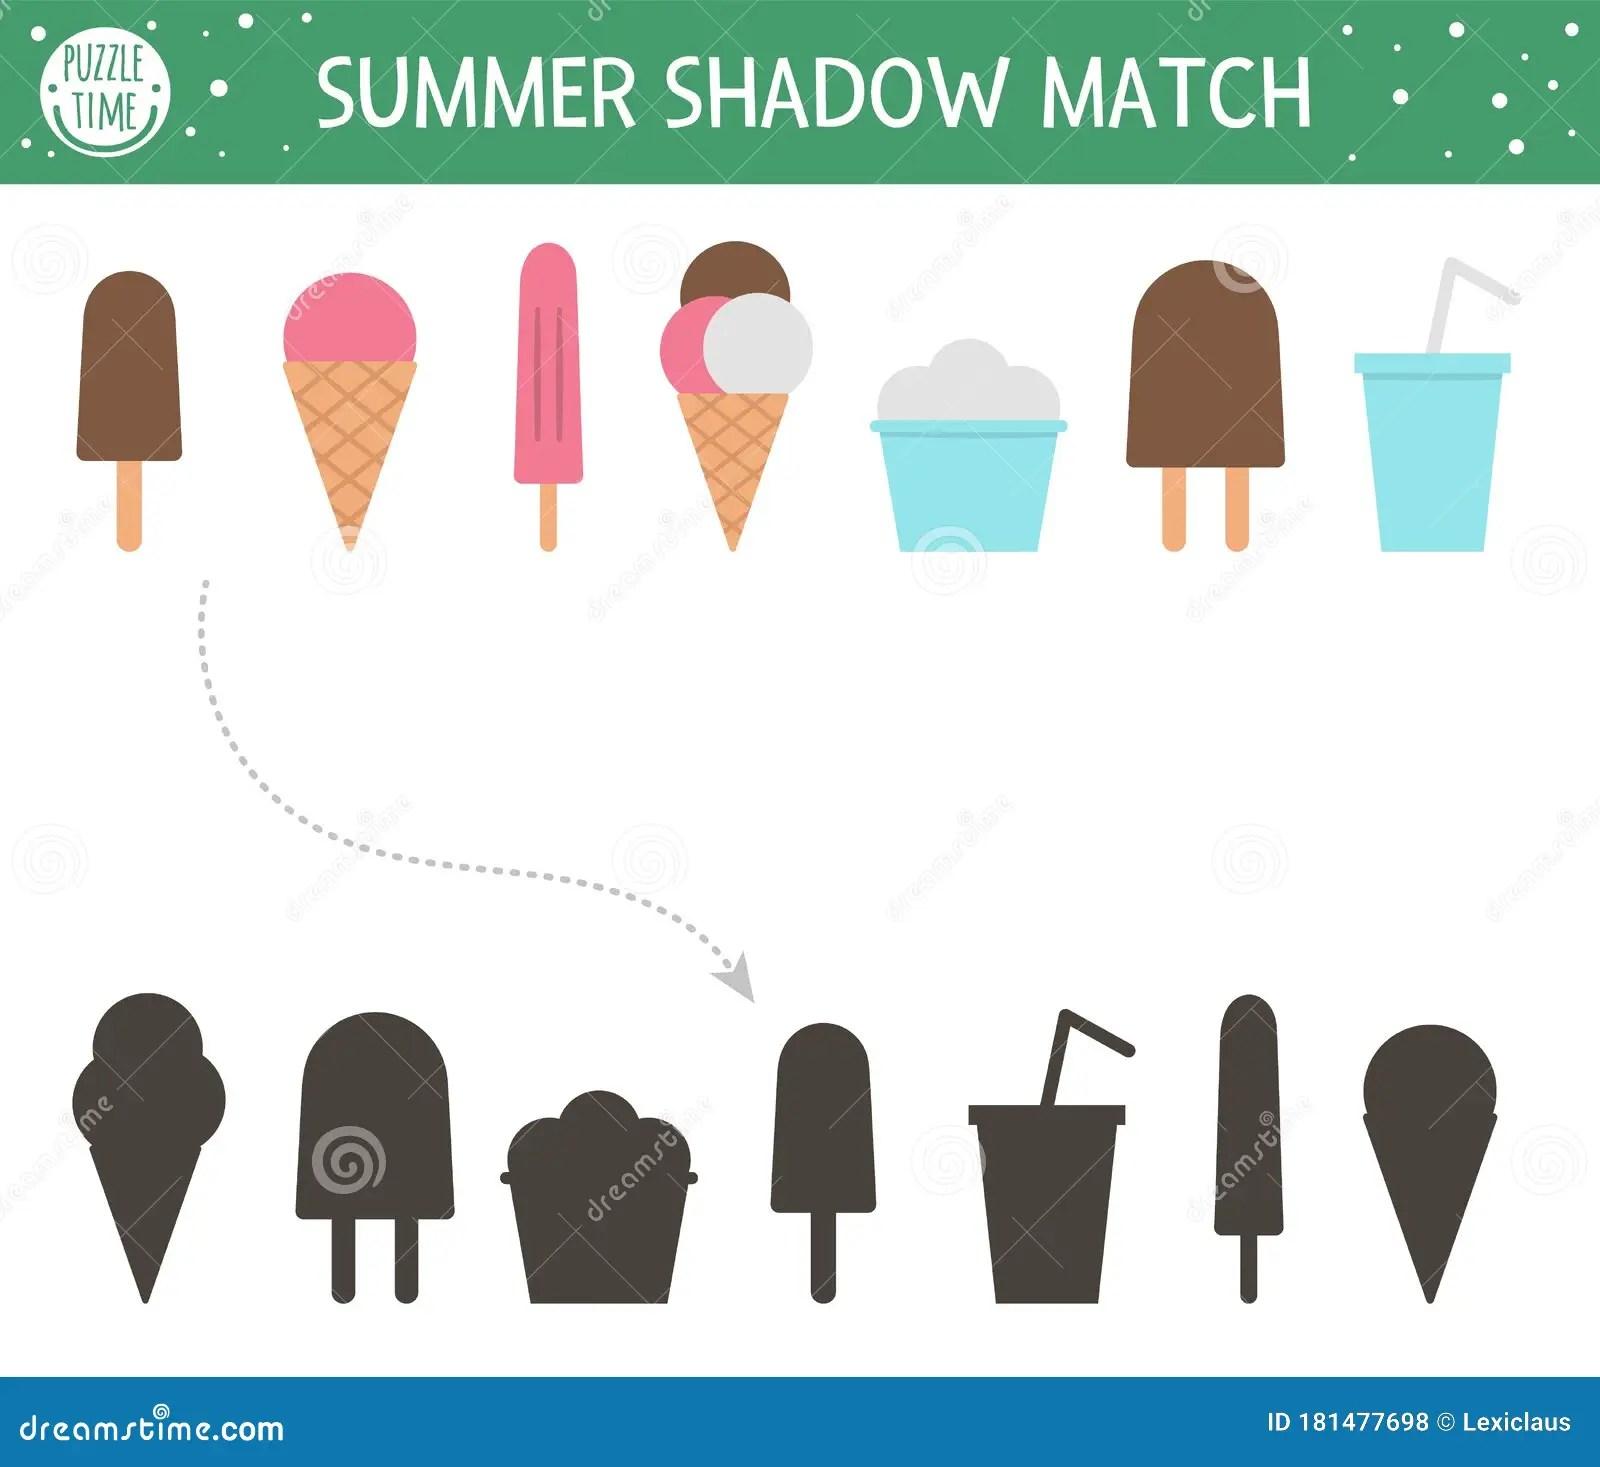 Summer Shadow Matching Activity For Children Preschool